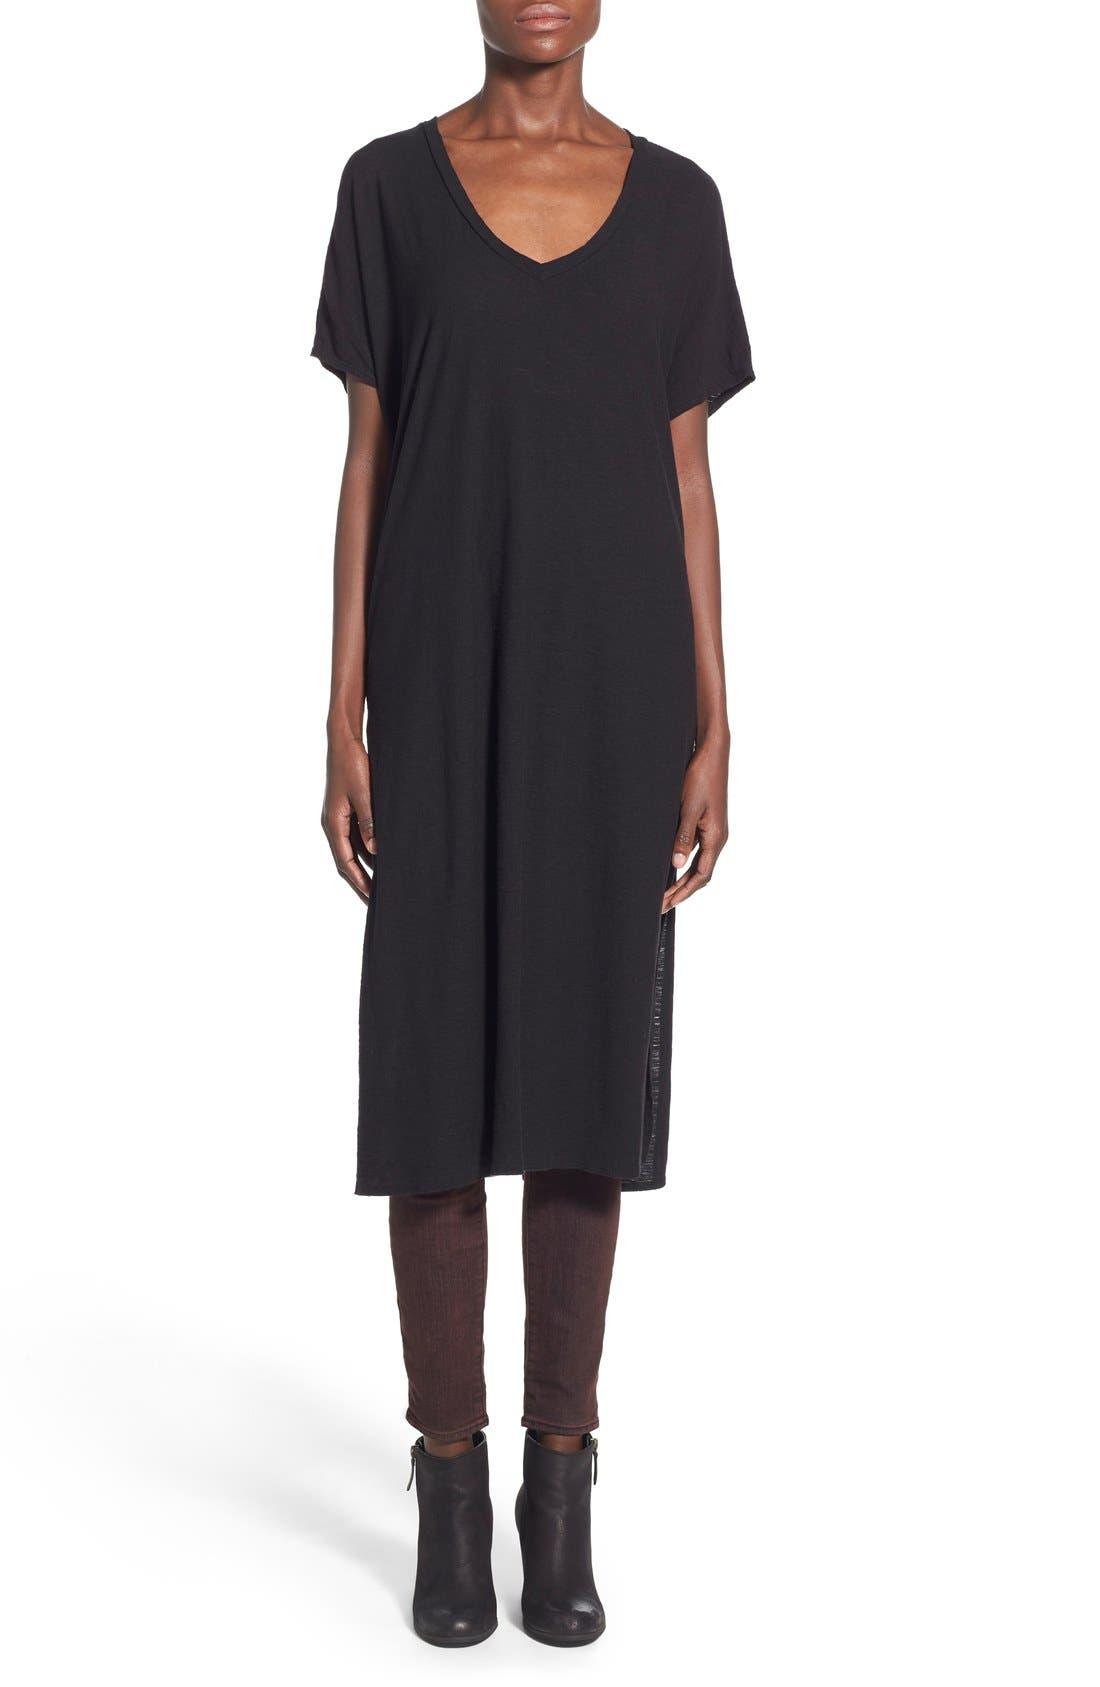 Alternate Image 1 Selected - Michelle by Comune 'Hayward' V-Neck T-Shirt Dress